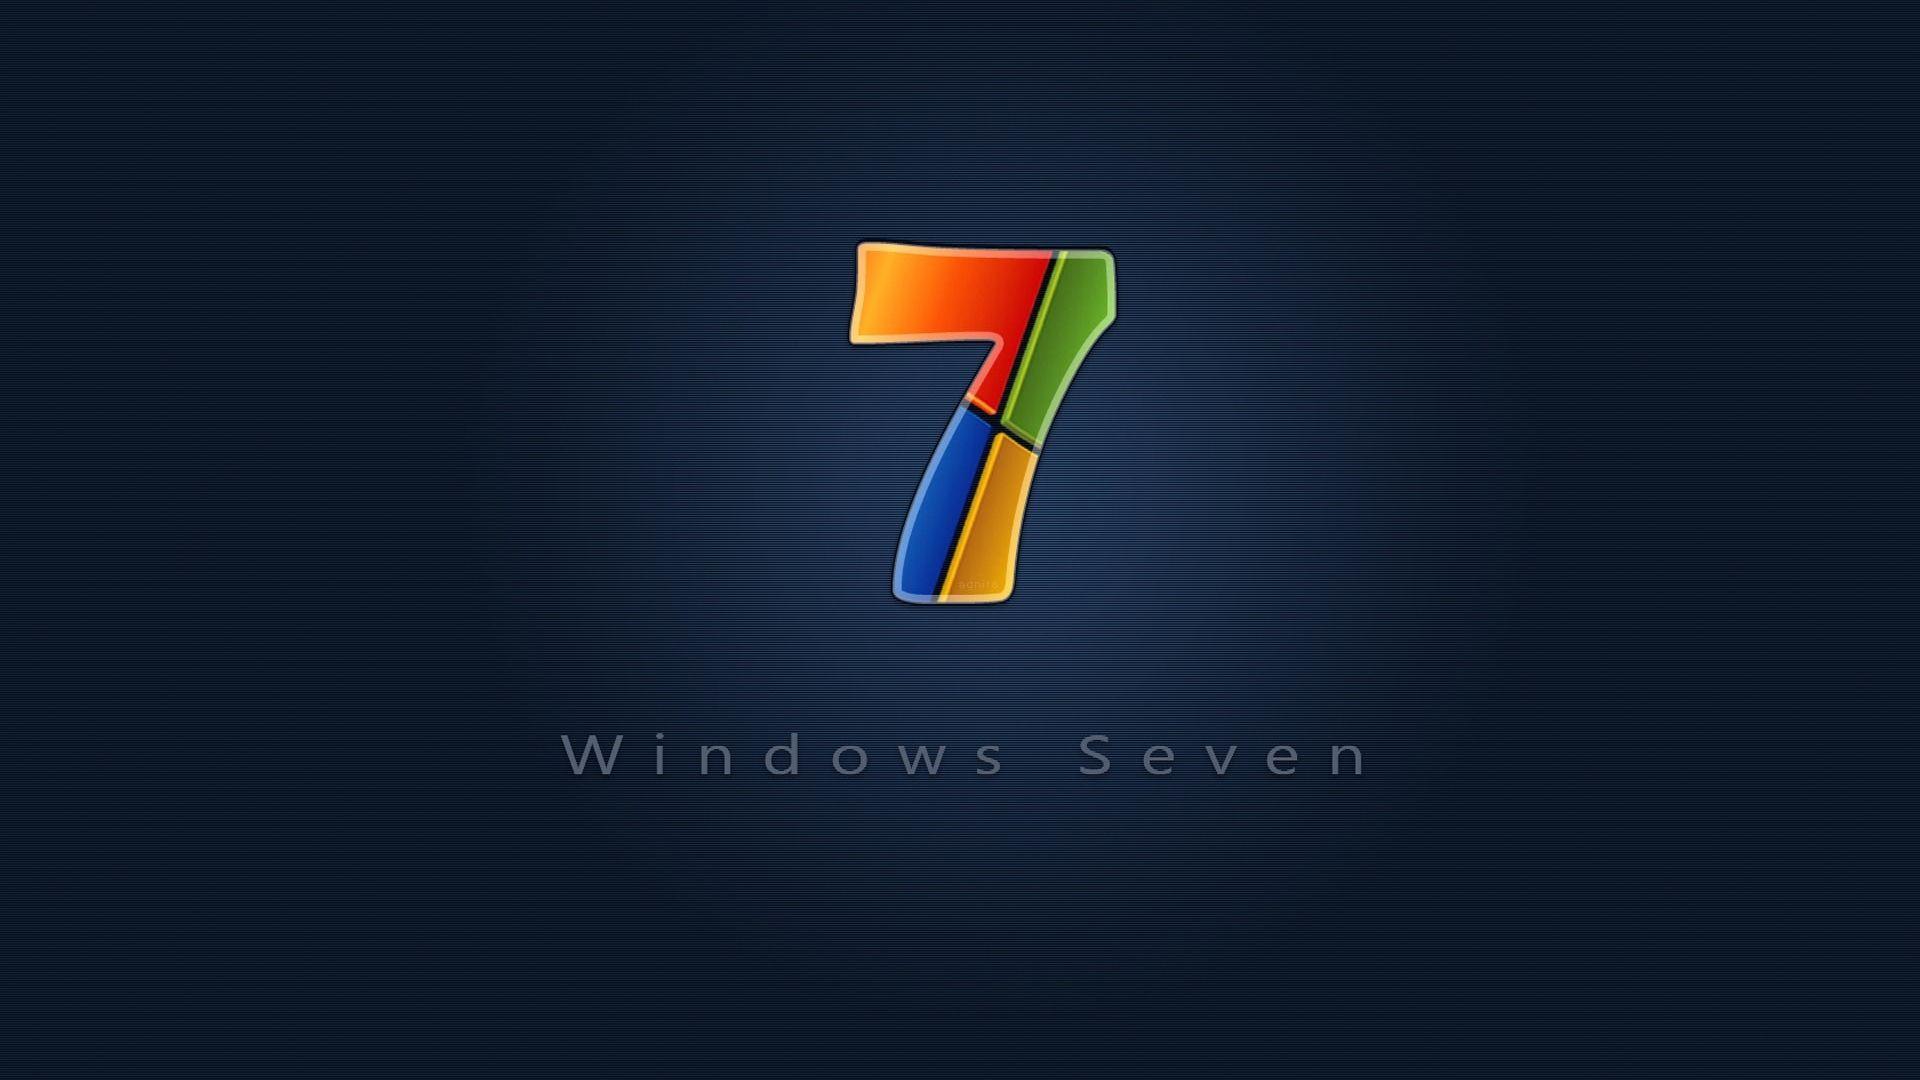 Microsoft Windows 7 Christmas Wallpaper